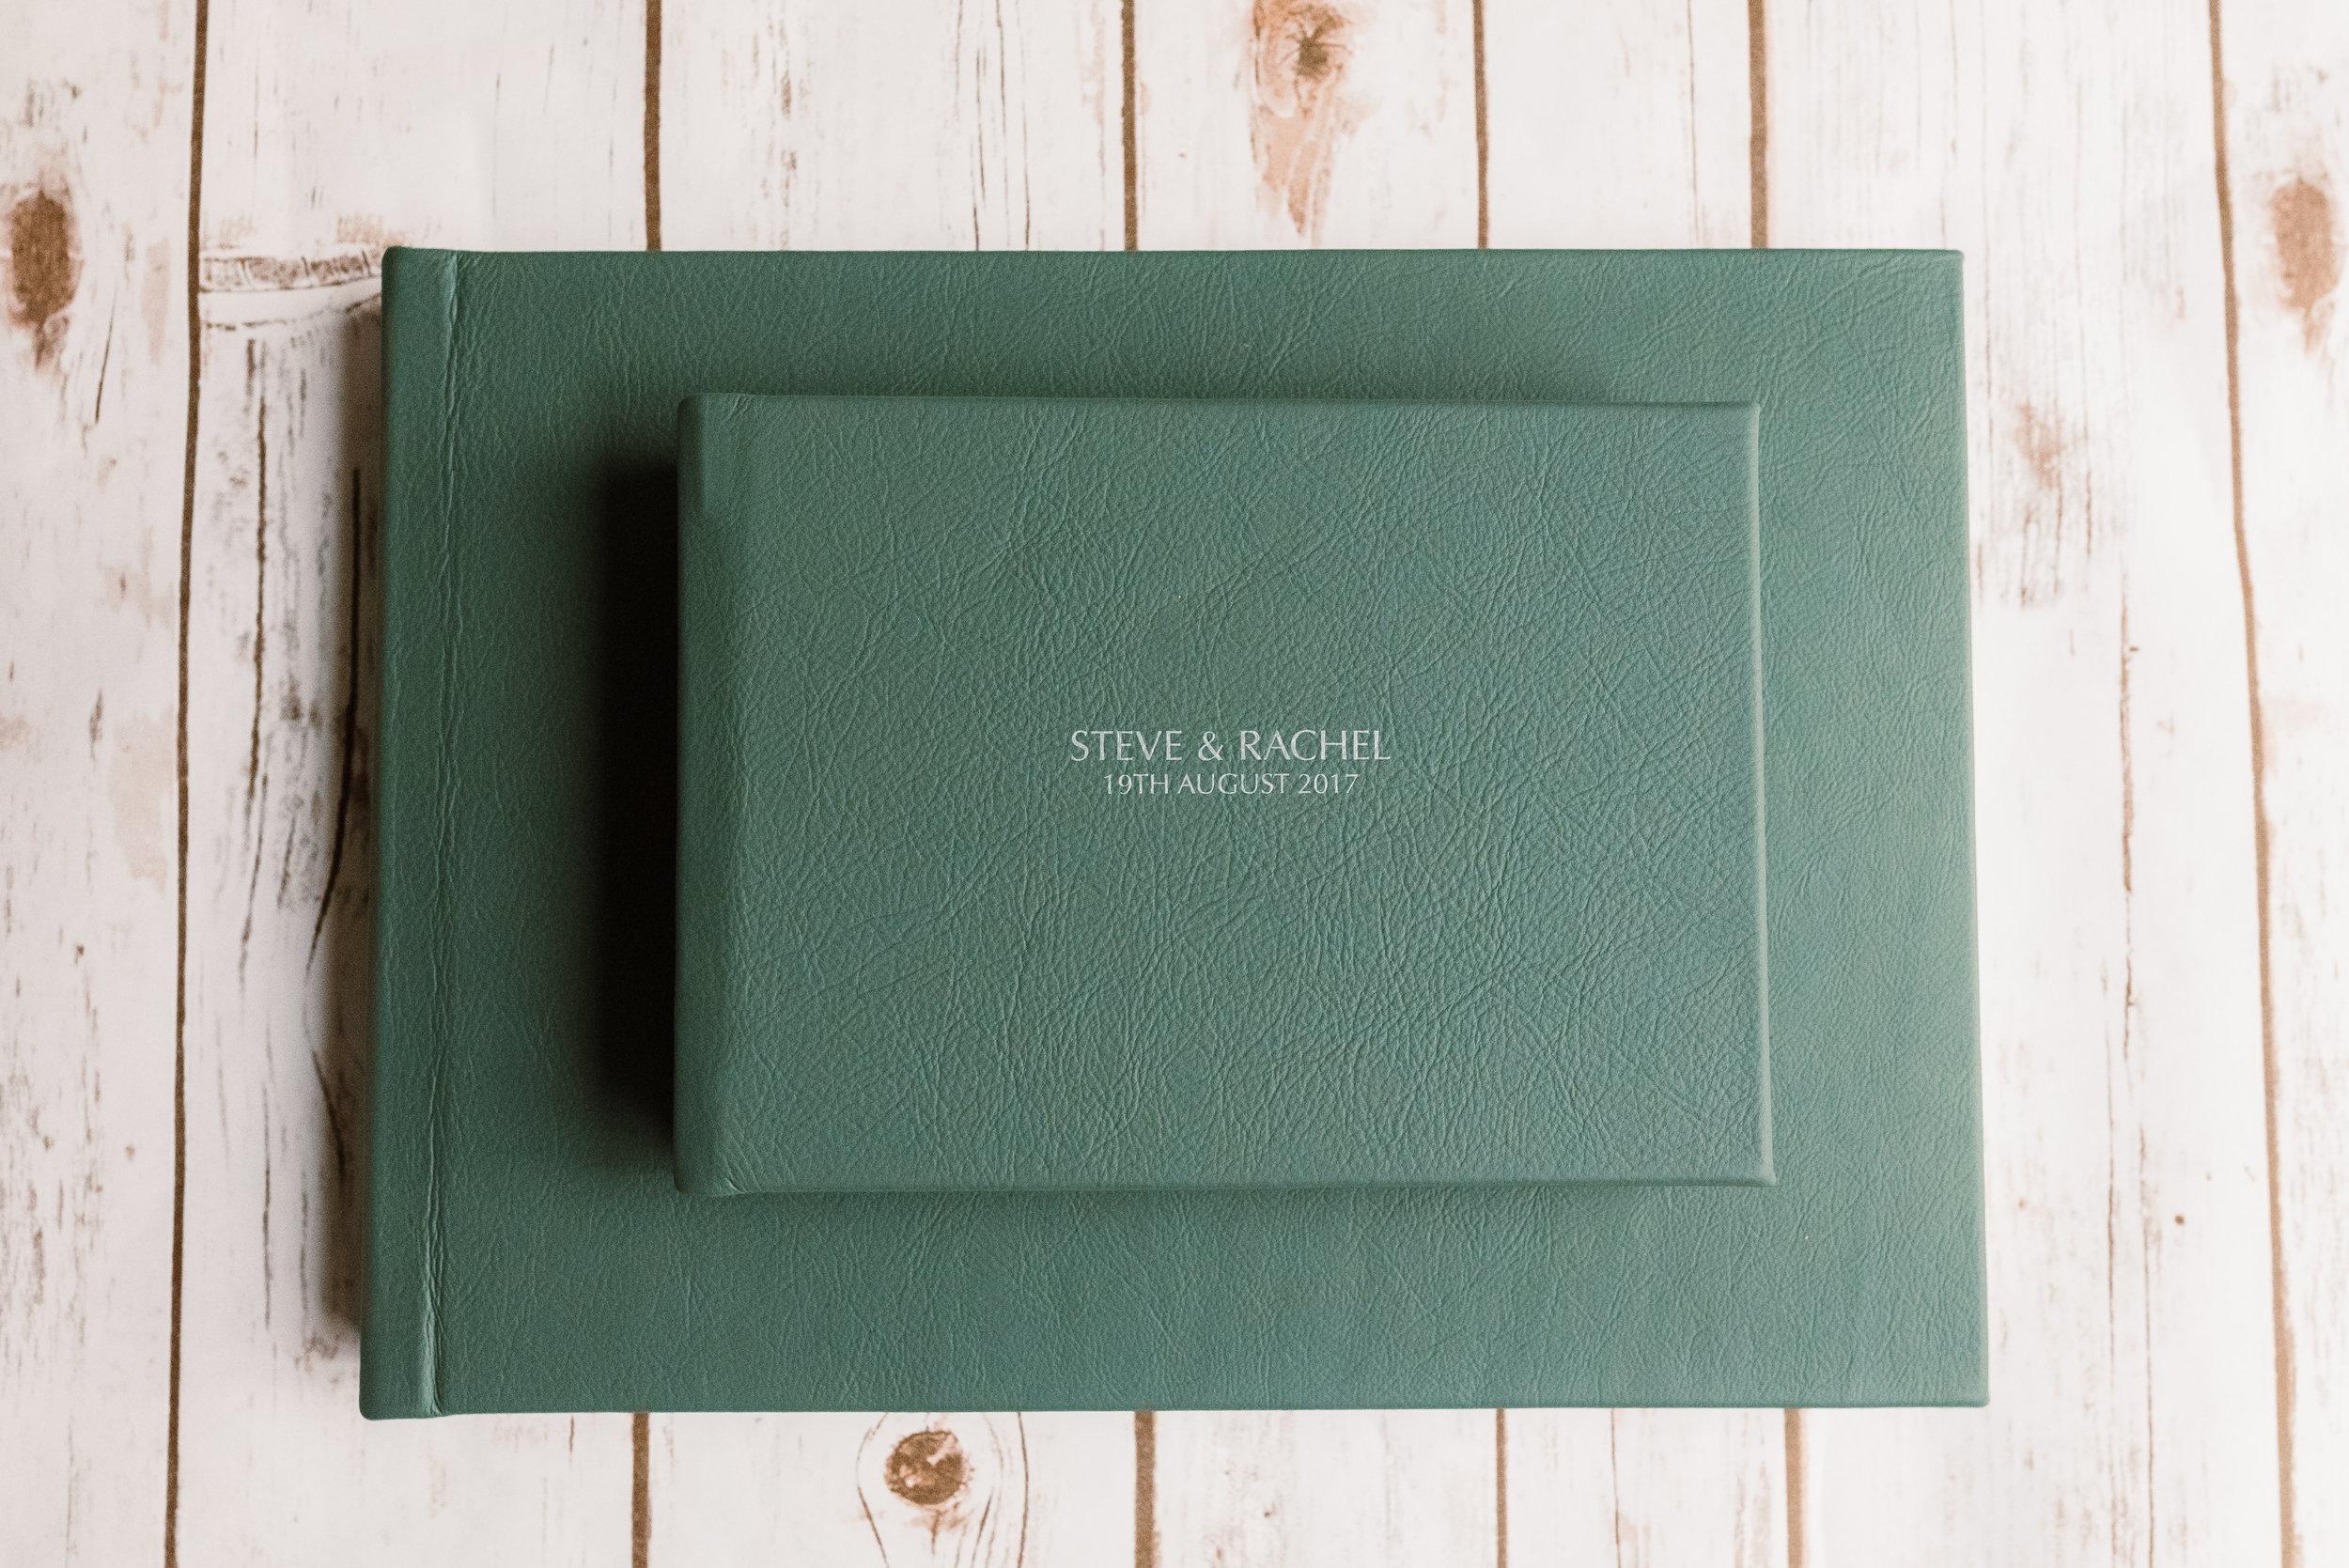 leather-bound-wedding-album-hampshire / Amy-james-photography / hampshire-wedding-photographer-hampshire / fleet-photographer-farnborough